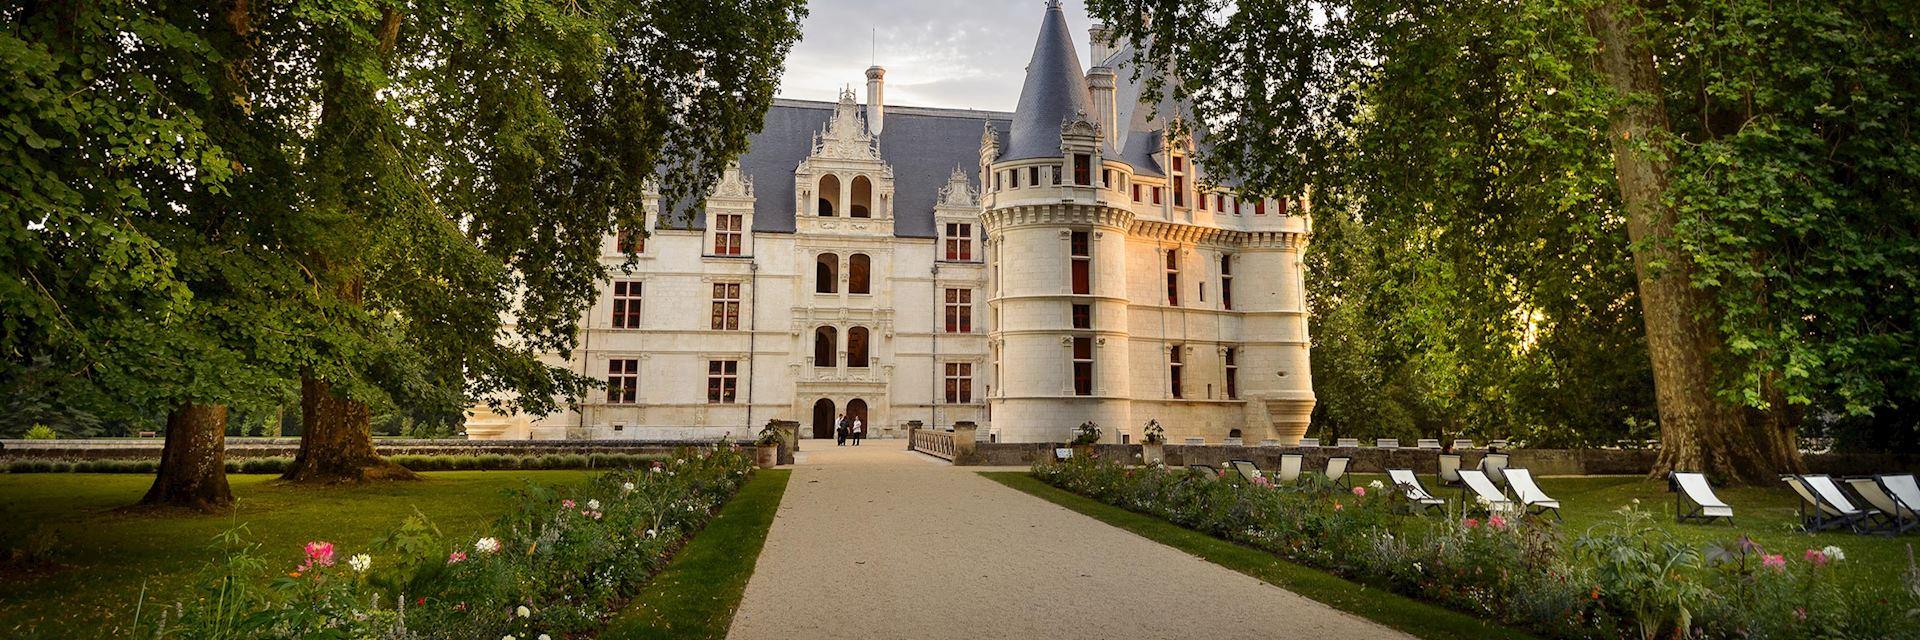 Château d'Azay-le-Rideau, Loire Valley (L+®onard de Serres - CMN)